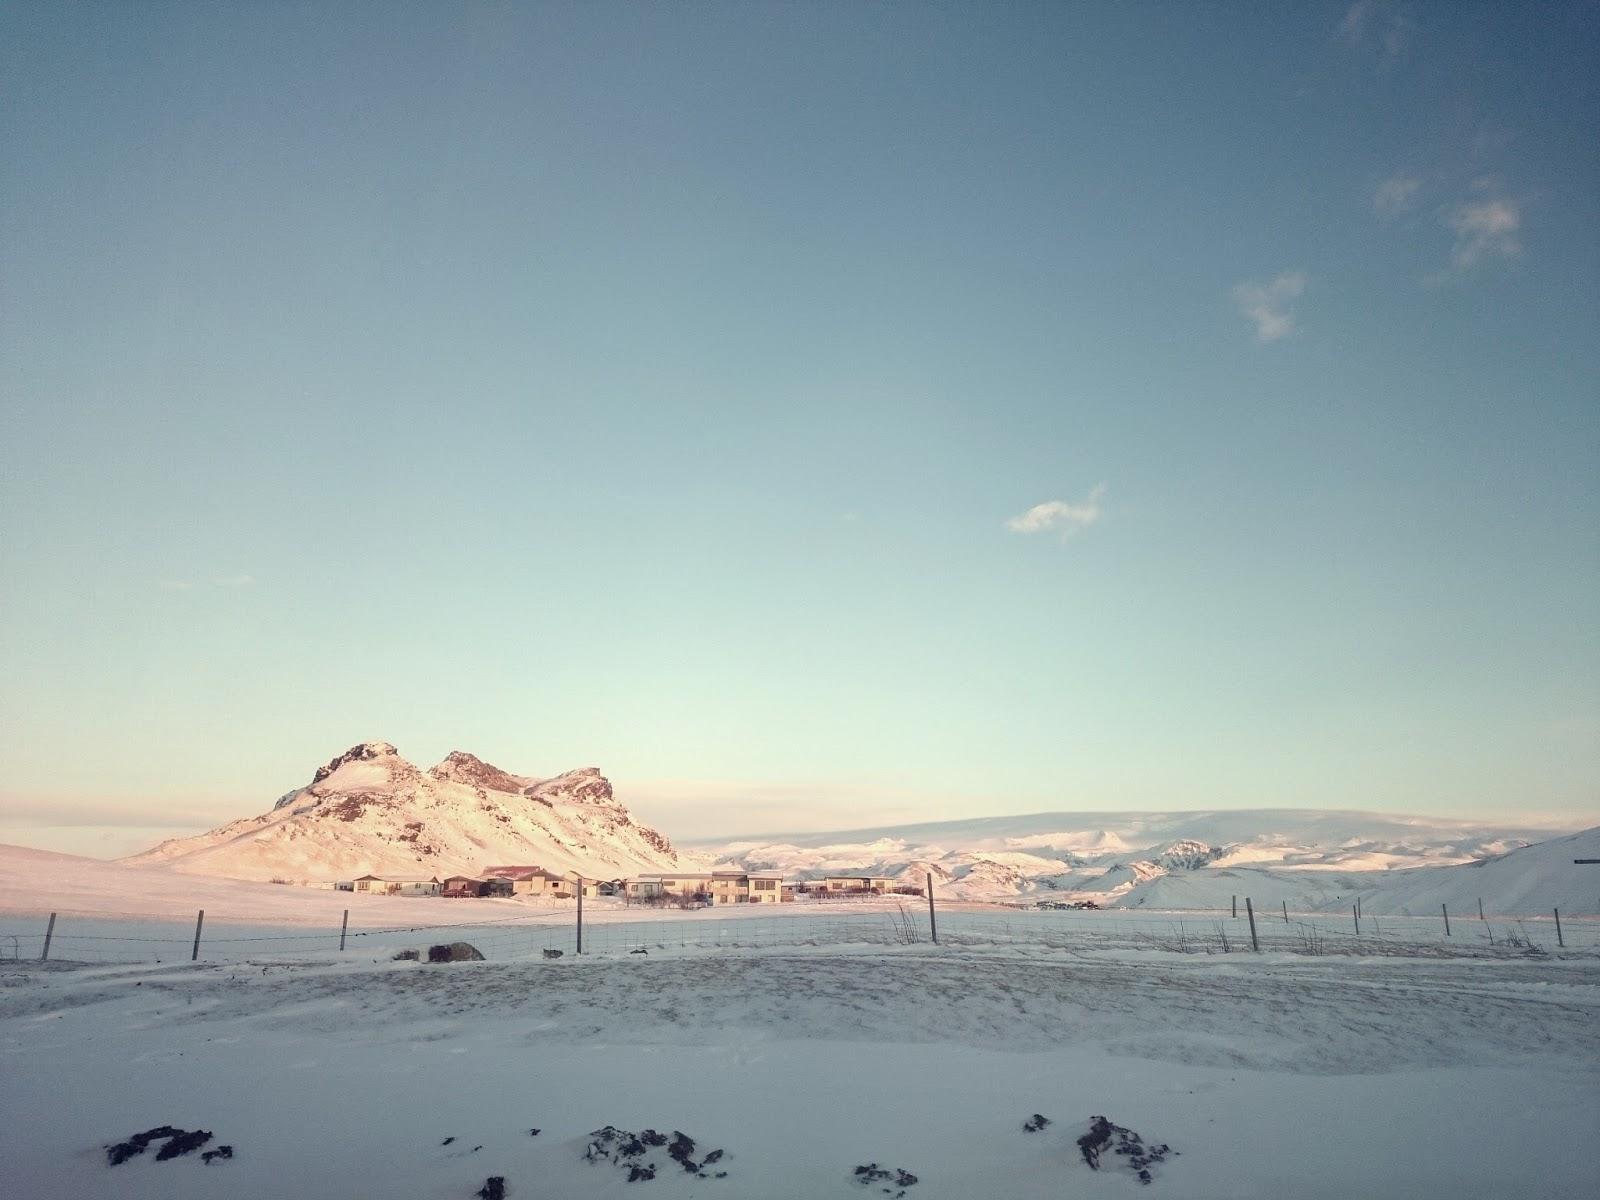 Islandzka zima, Islandia, Iceland, blog o Islandii, zima, panidorcia, Pani Dorcia, blog, islandzki krajobraz